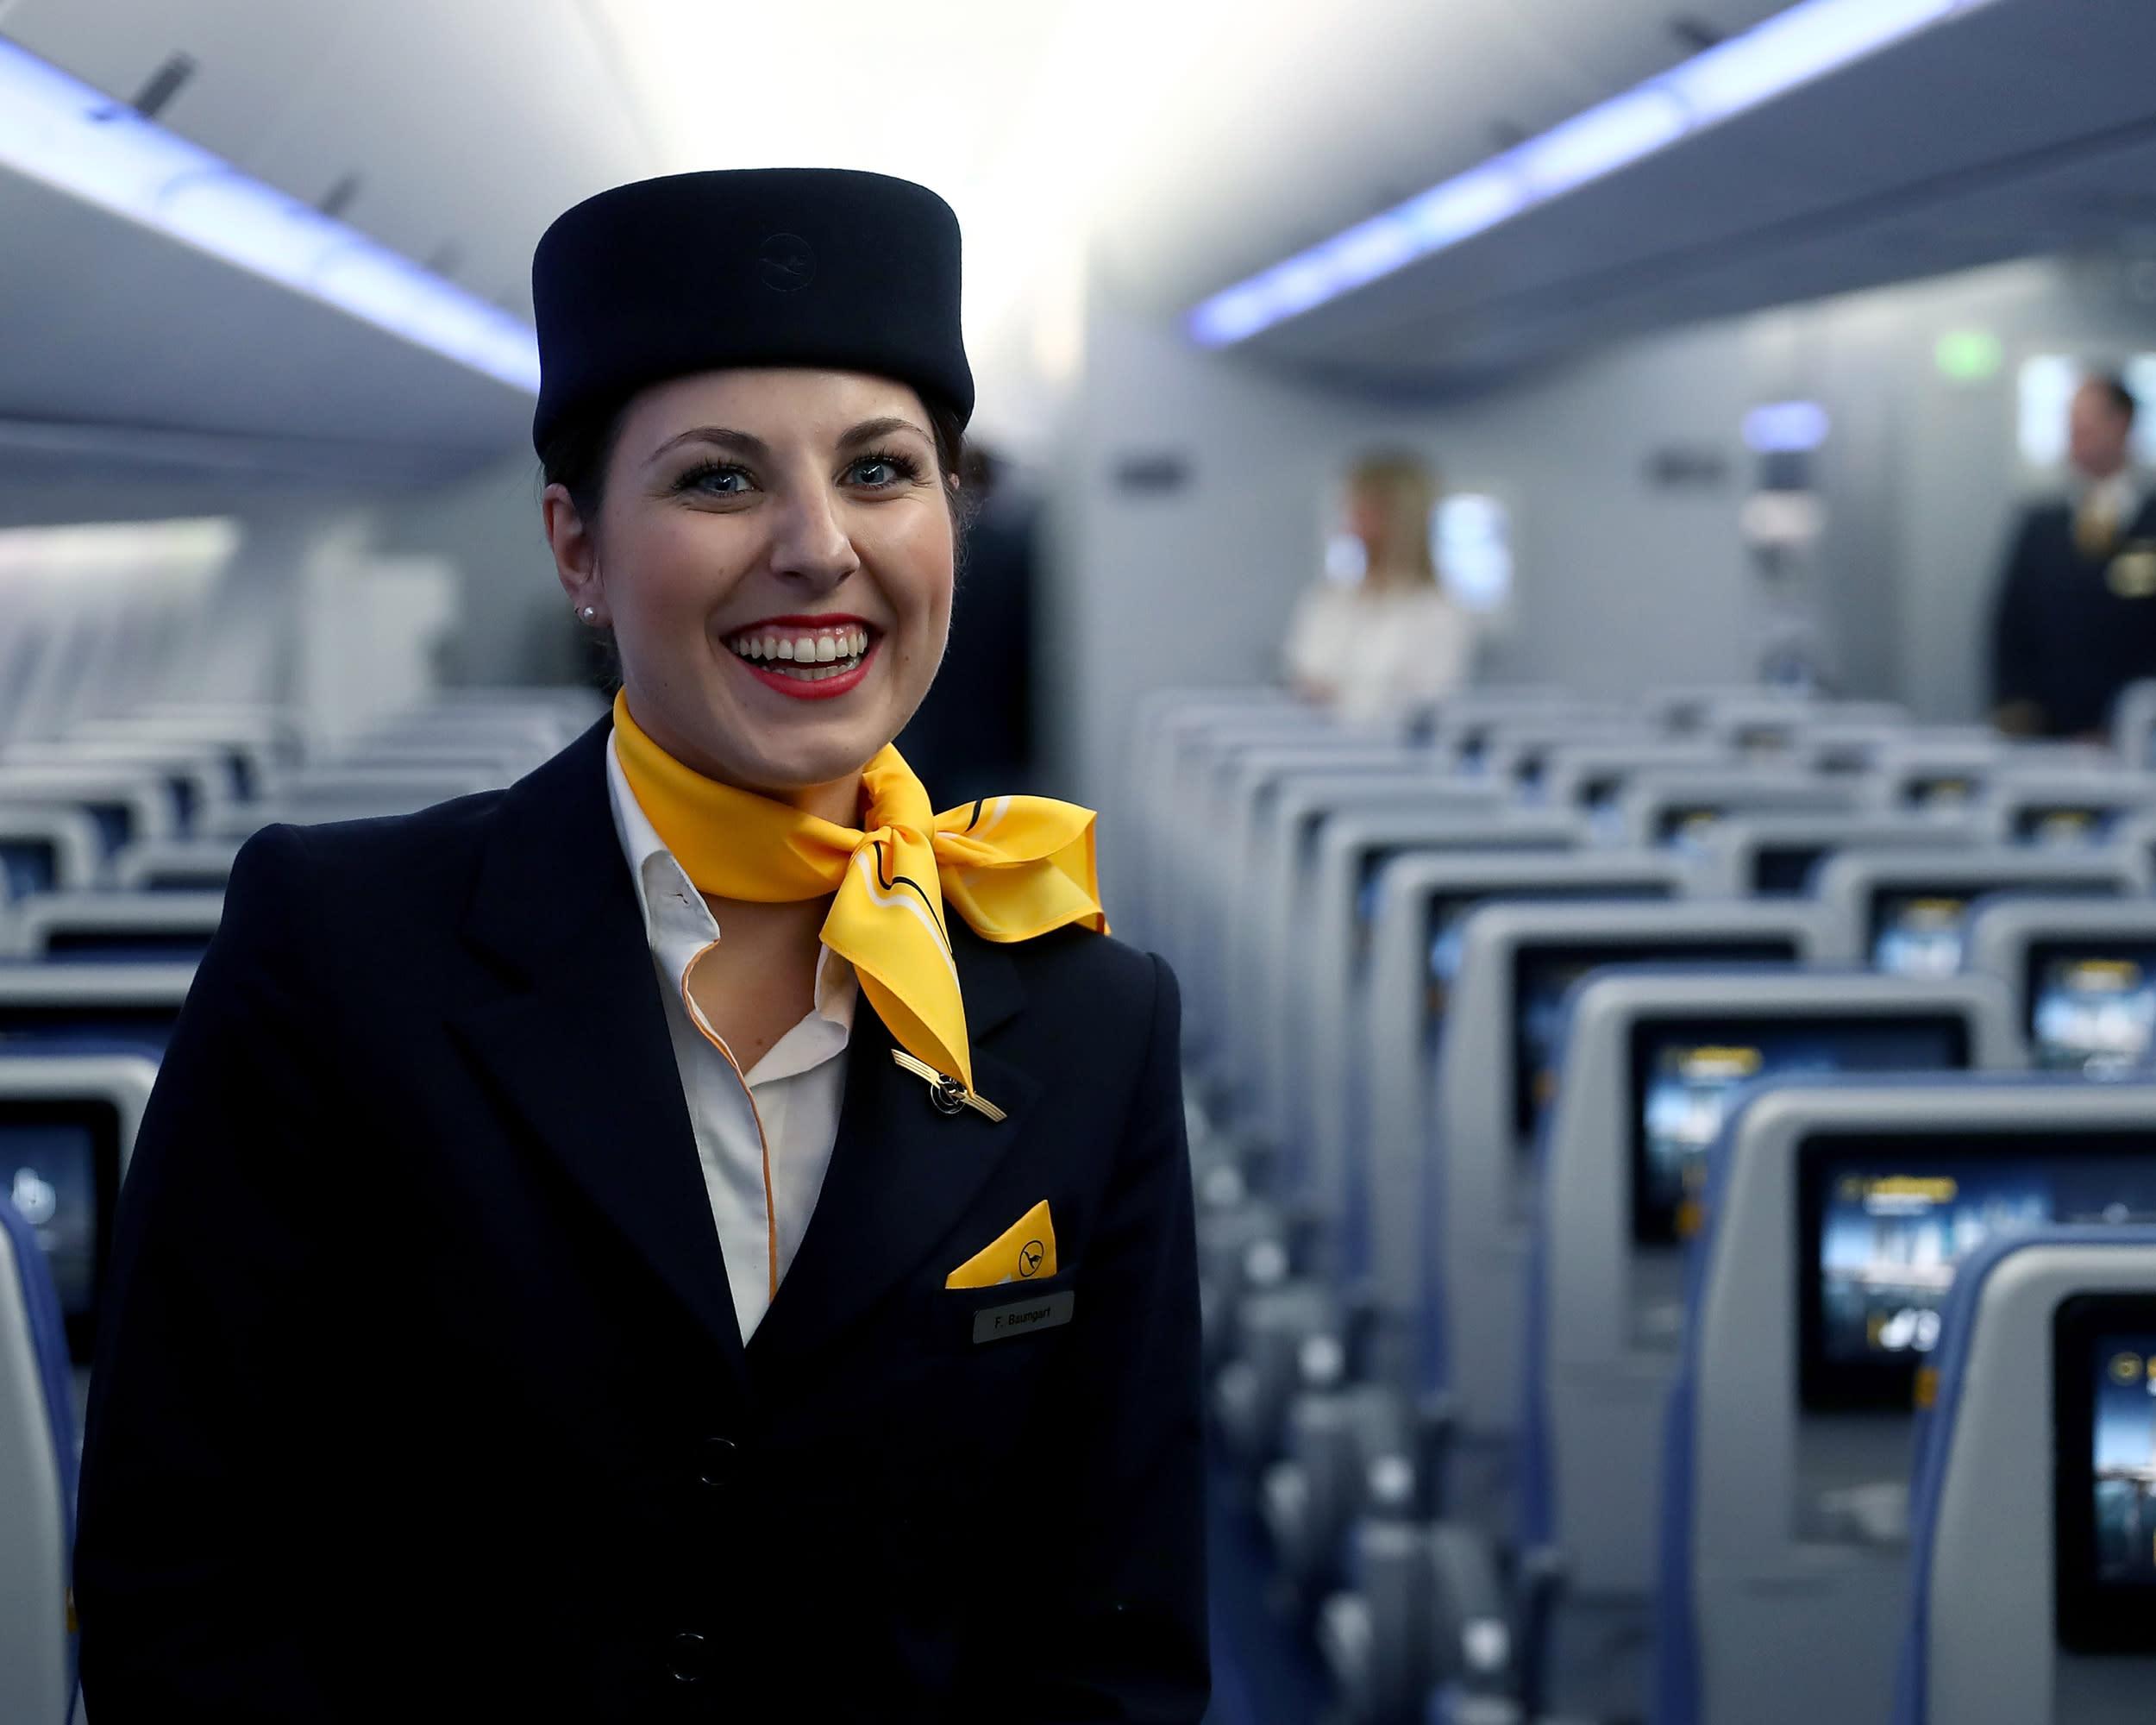 Фото стюардесса ххх, Голые стюардессы - Лучшее фото 28 фотография